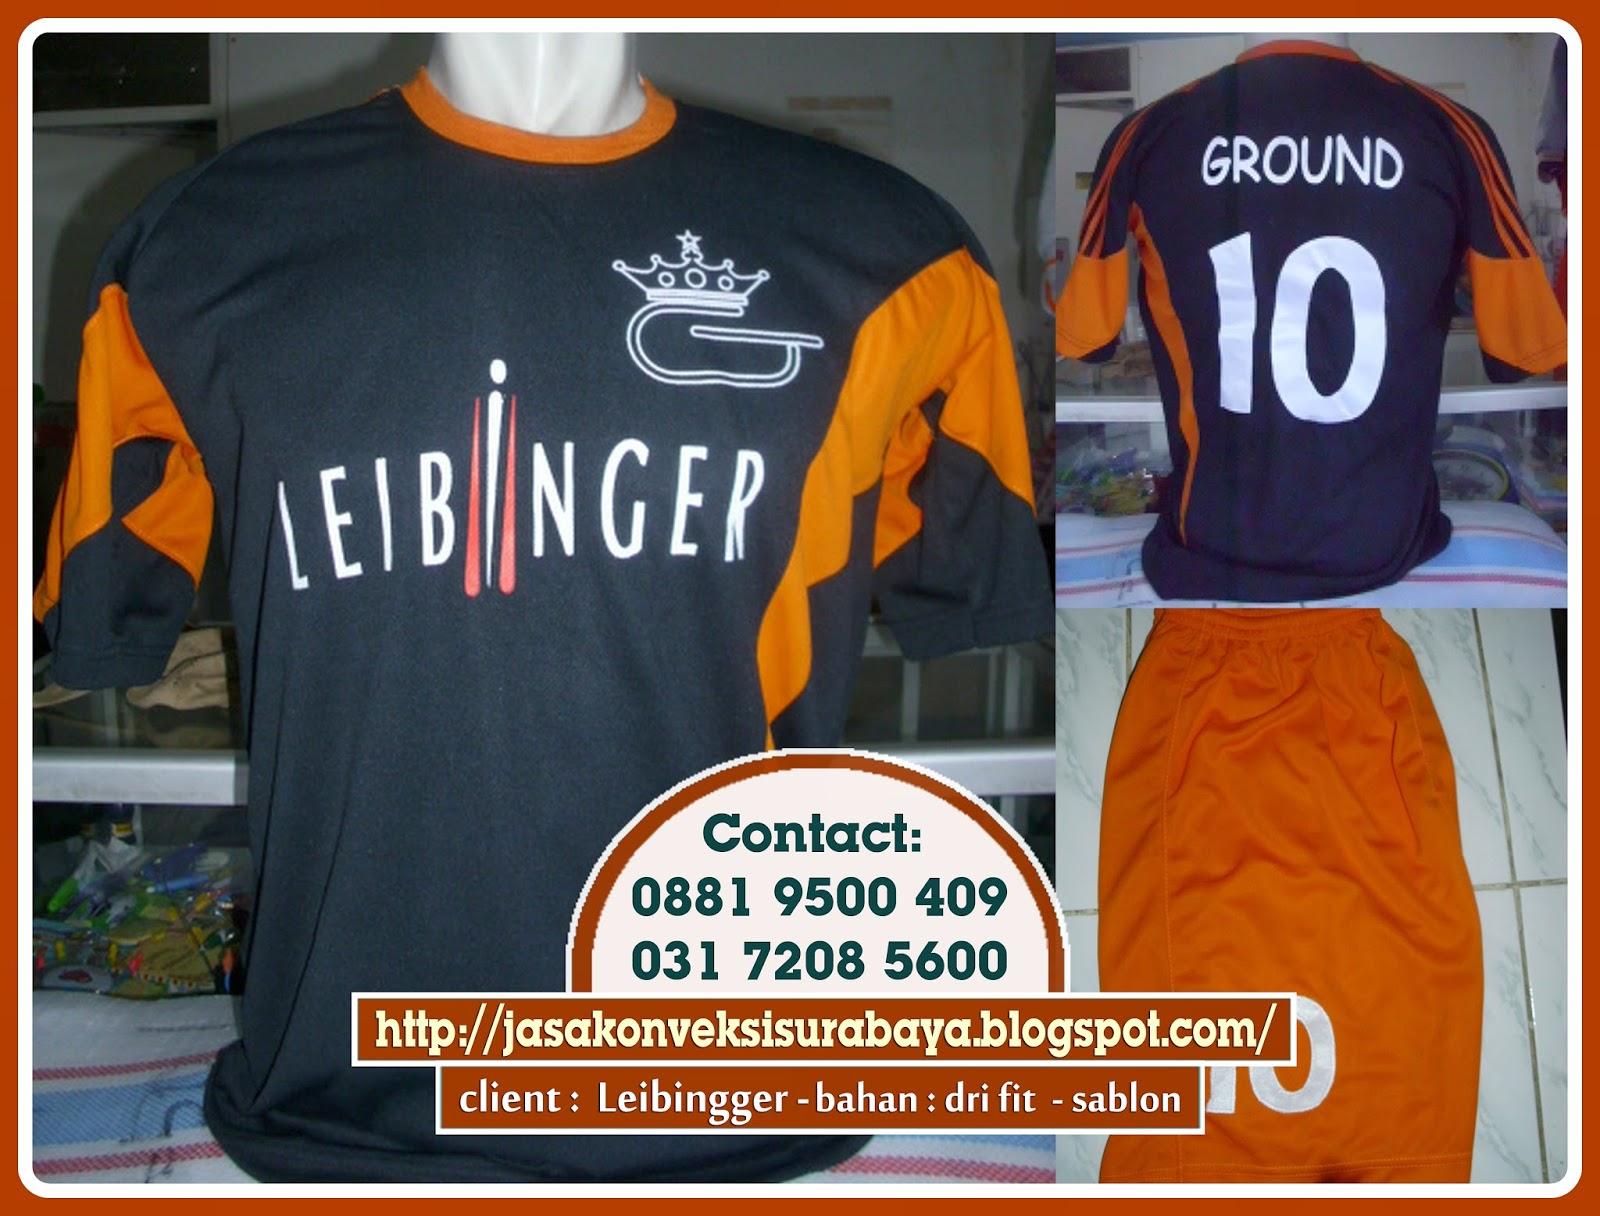 Konveksi Pakaian Olahraga futsal, Konveksi Pakaian Olahraga sablon, Konveksi Pakaian Olahraga Surabaya,